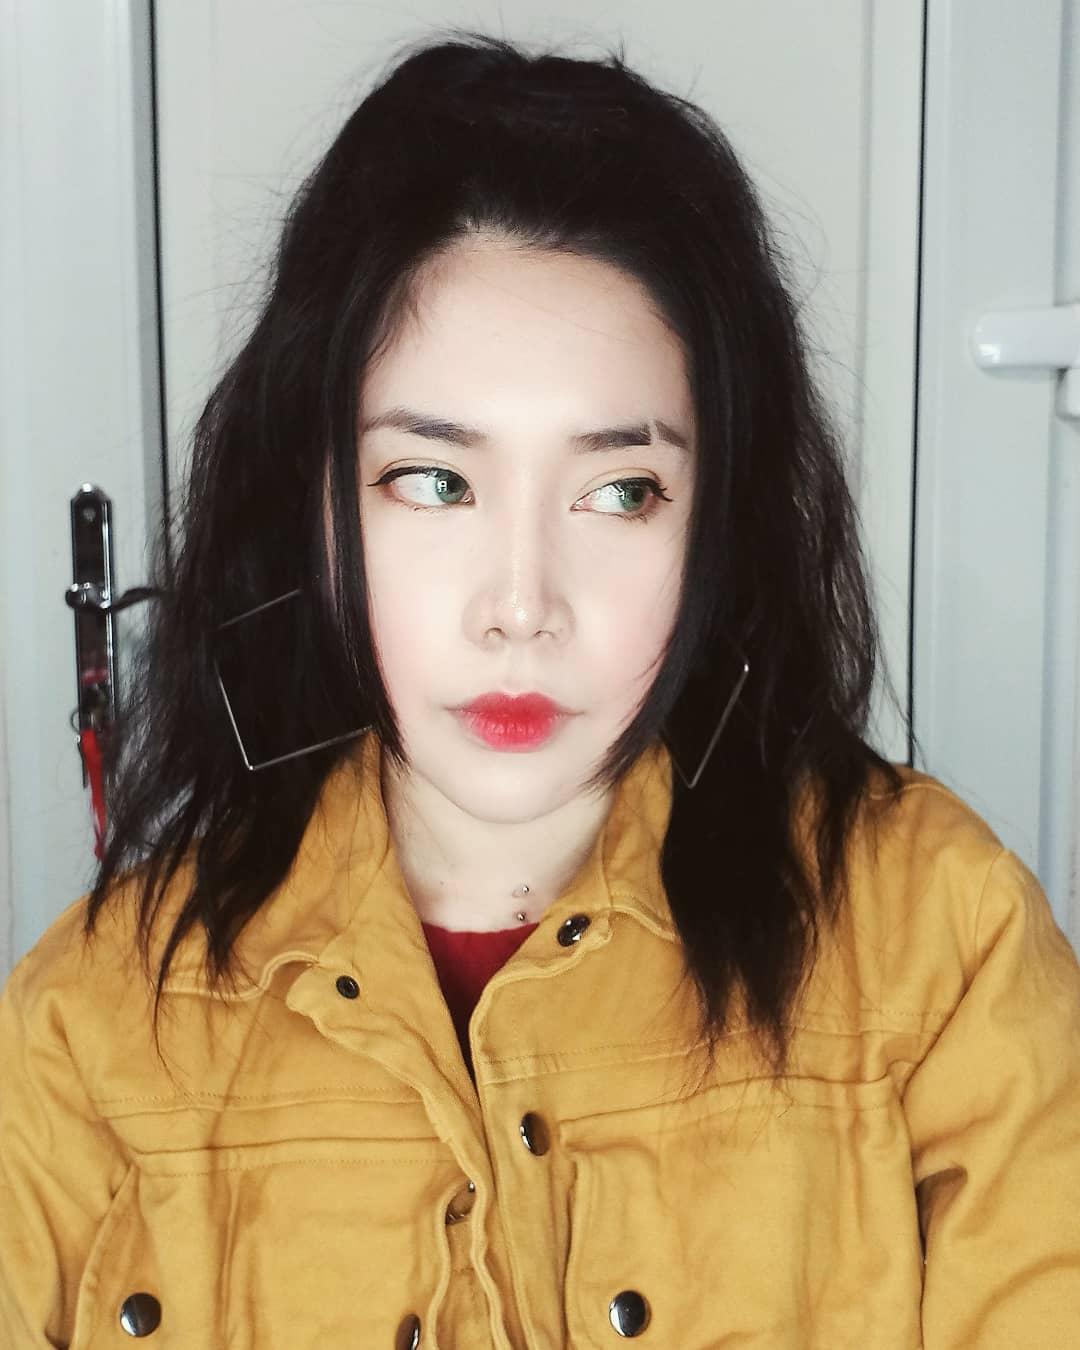 Lee D cosplayer Youtuber